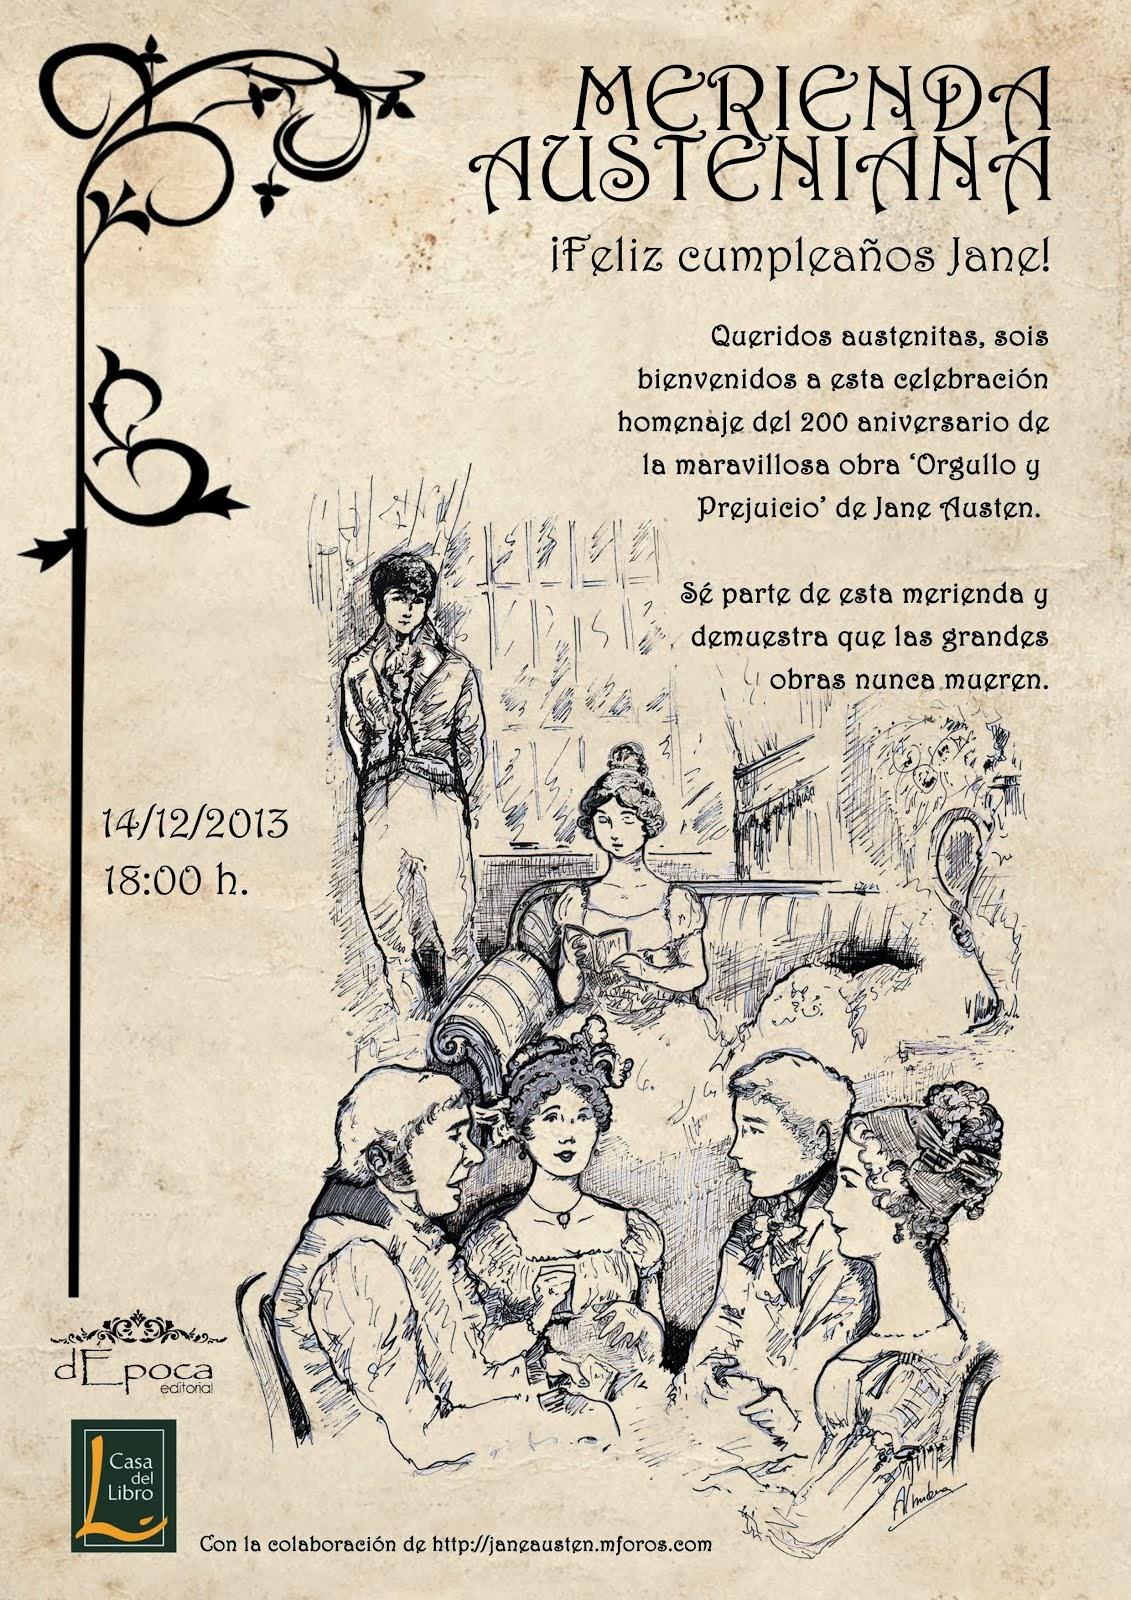 Austen in Malaga